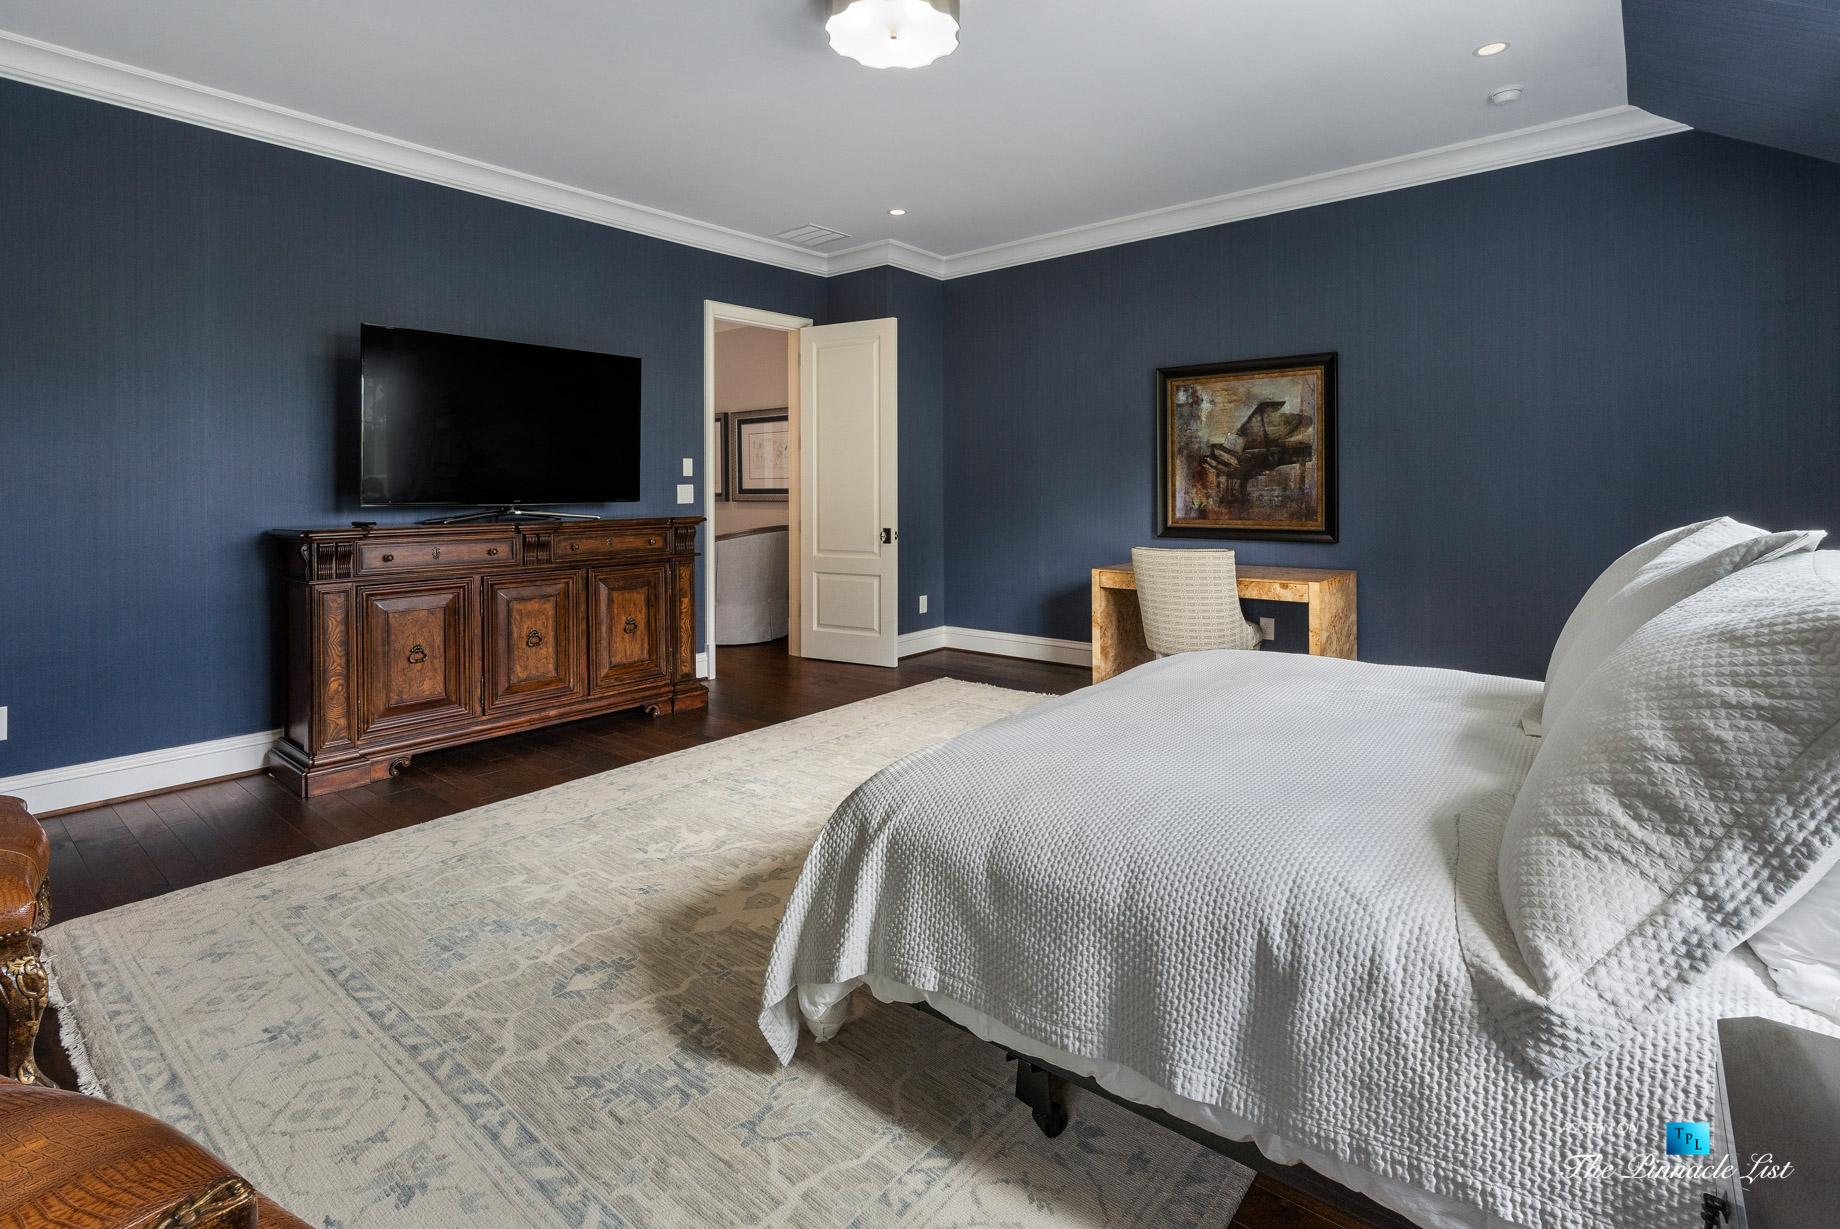 1150 W Garmon Rd, Atlanta, GA, USA – Bedroom – Luxury Real Estate – Buckhead Estate Home